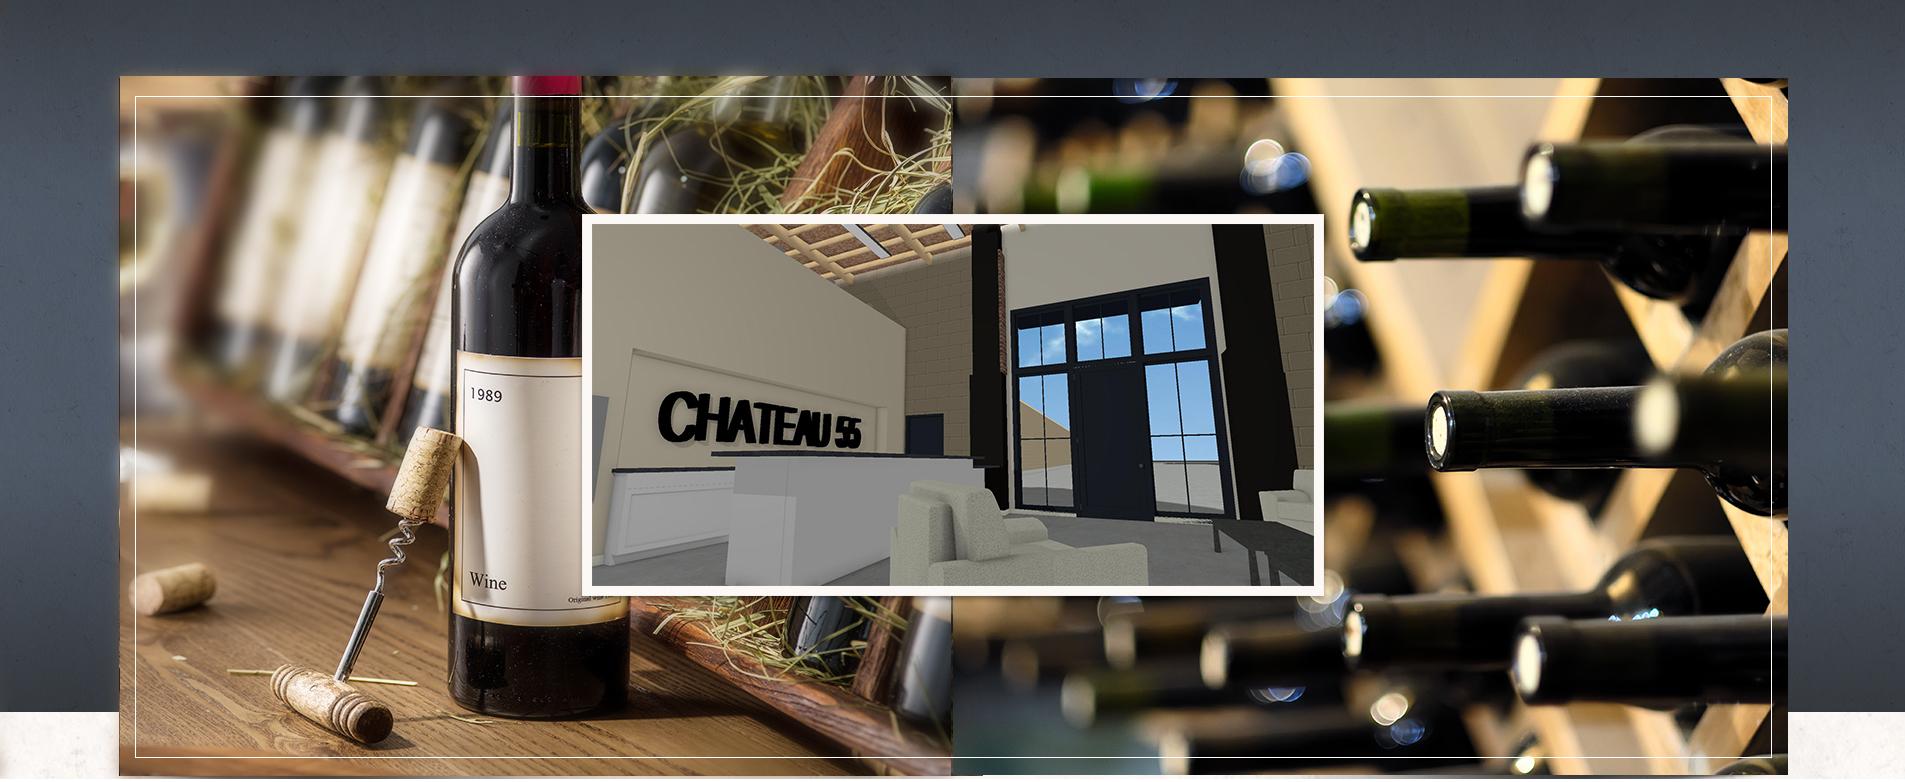 chateau-55-m